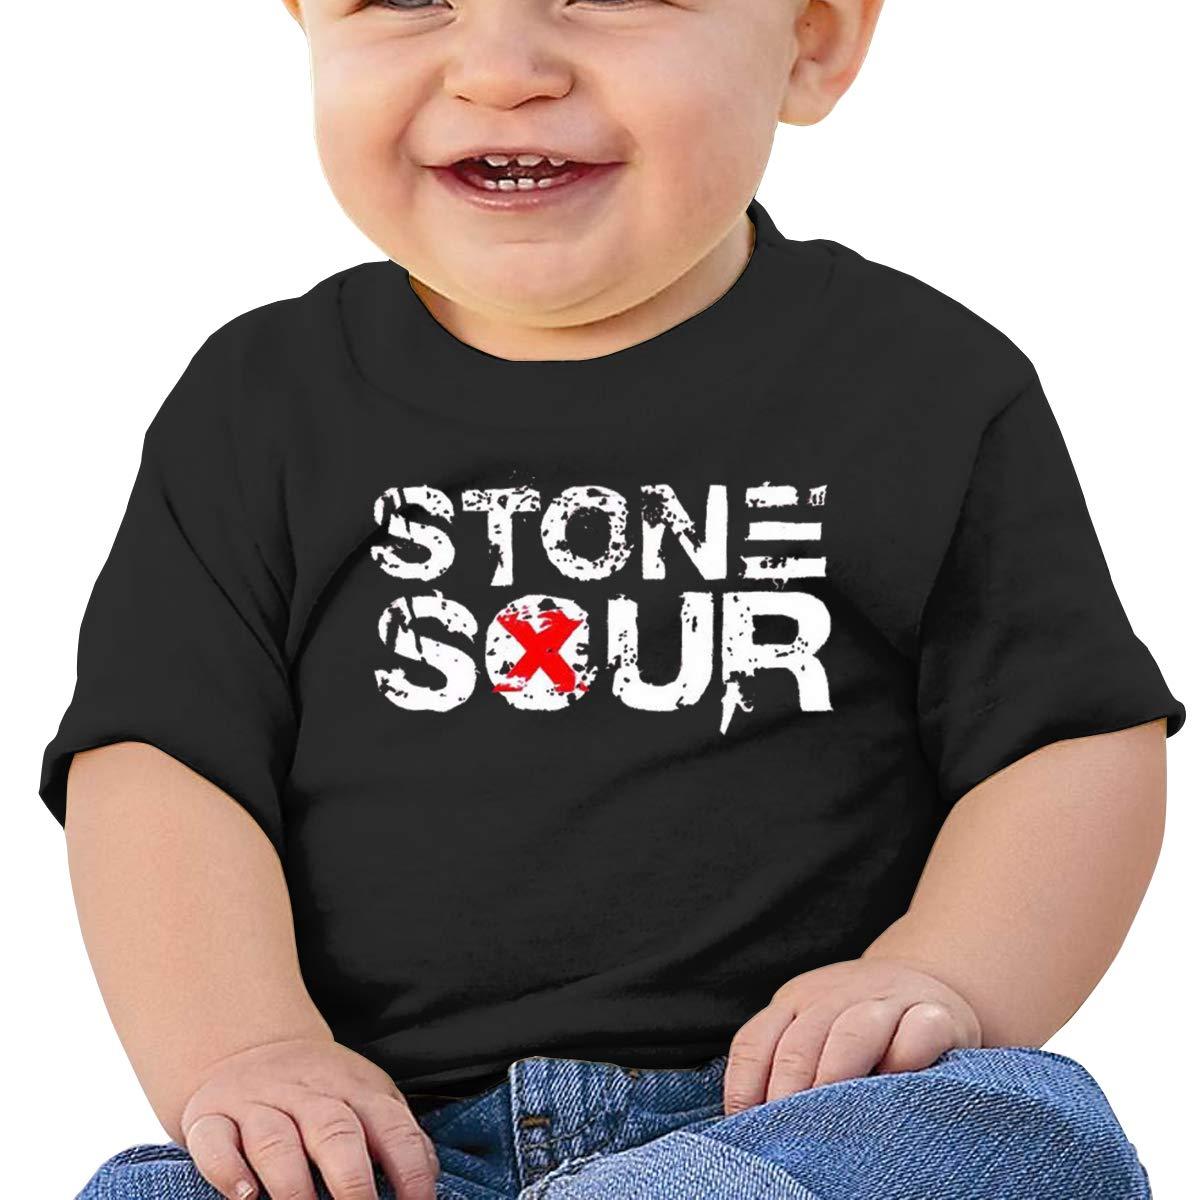 MONIKAL Unisex Infant Short Sleeve T-Shirt Stone-Sour Toddler Kids Organic Cotton Graphic Tee Tops